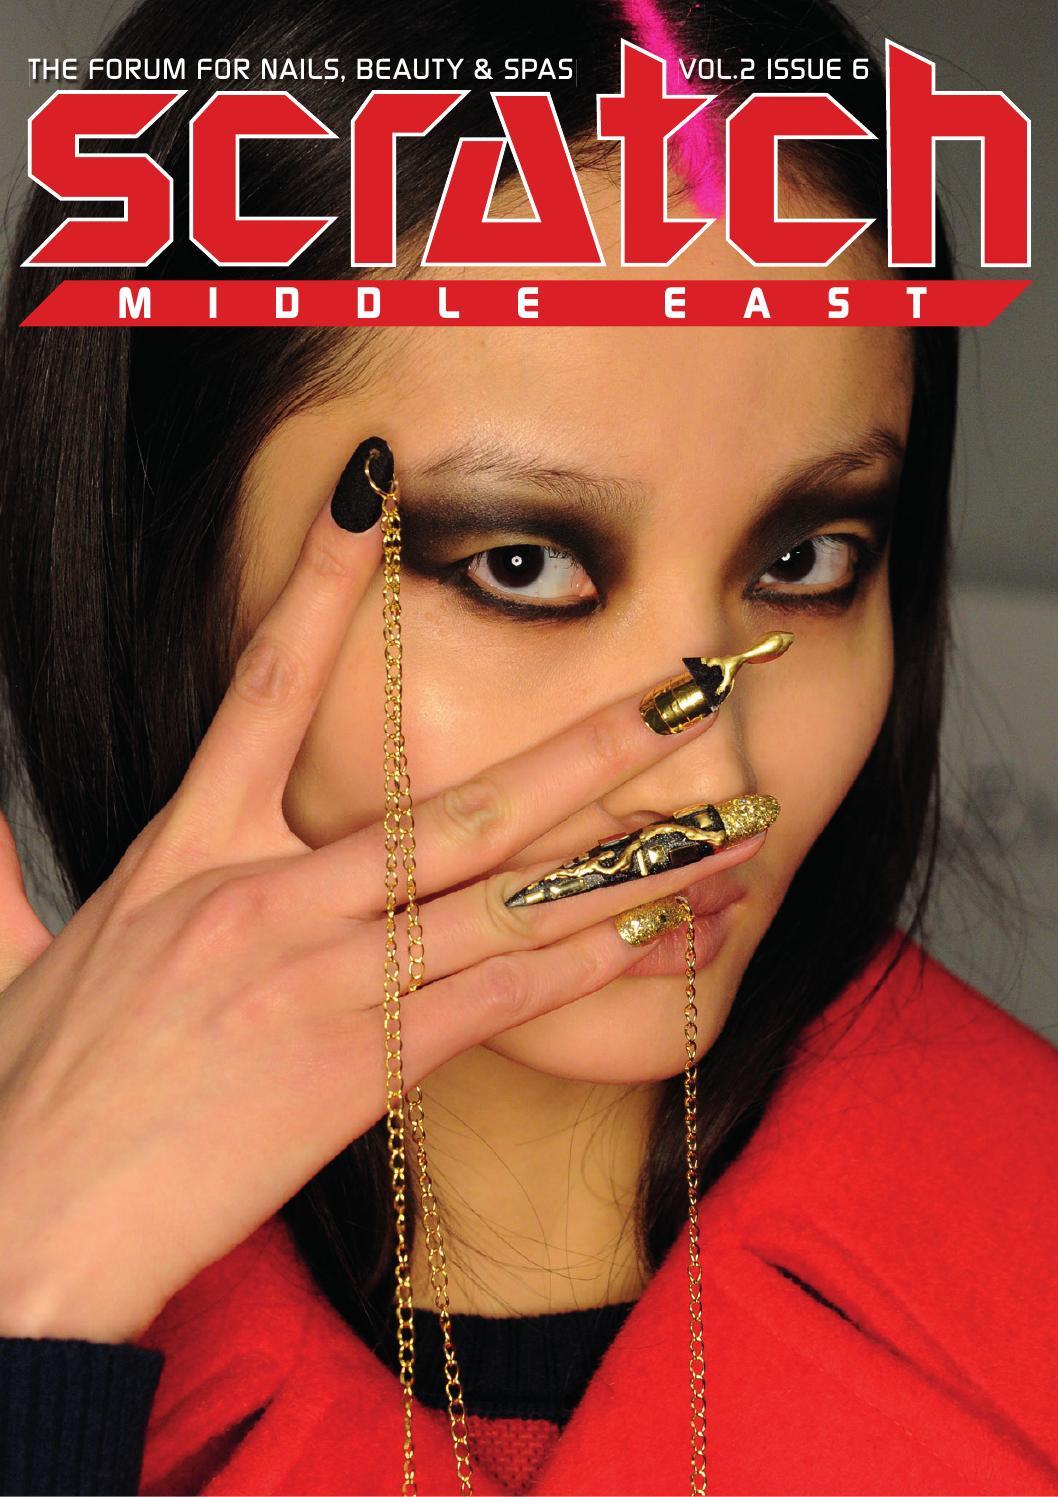 5cb10c407 Scratch Middle East, vol2 issue6 by tlc design studio - issuu